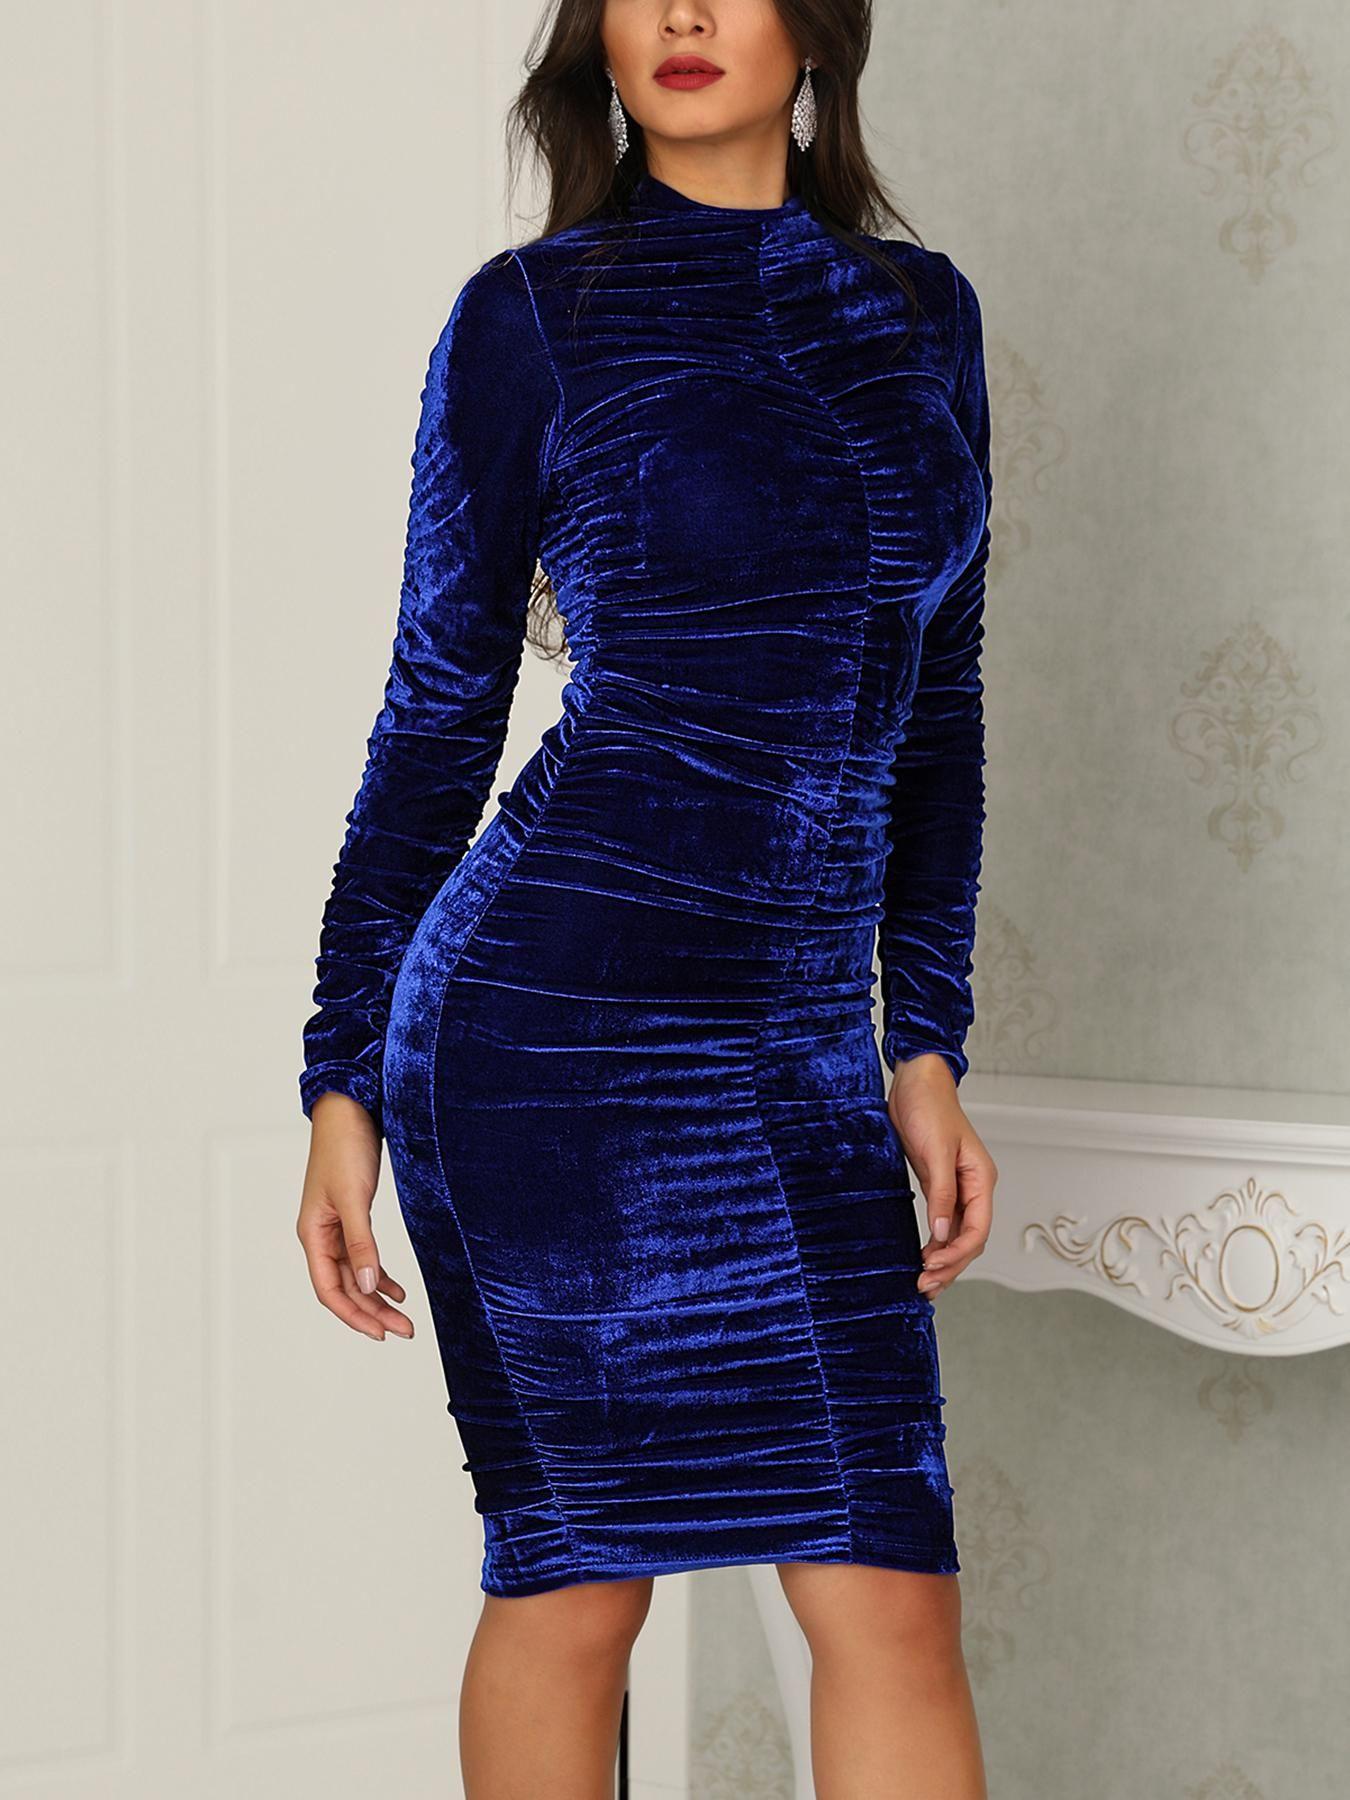 6fd332f589668 Velvet High Neck Scrunched Bodycon Dress #styleblog #stylegram  #styleblogger #fashiondiaries